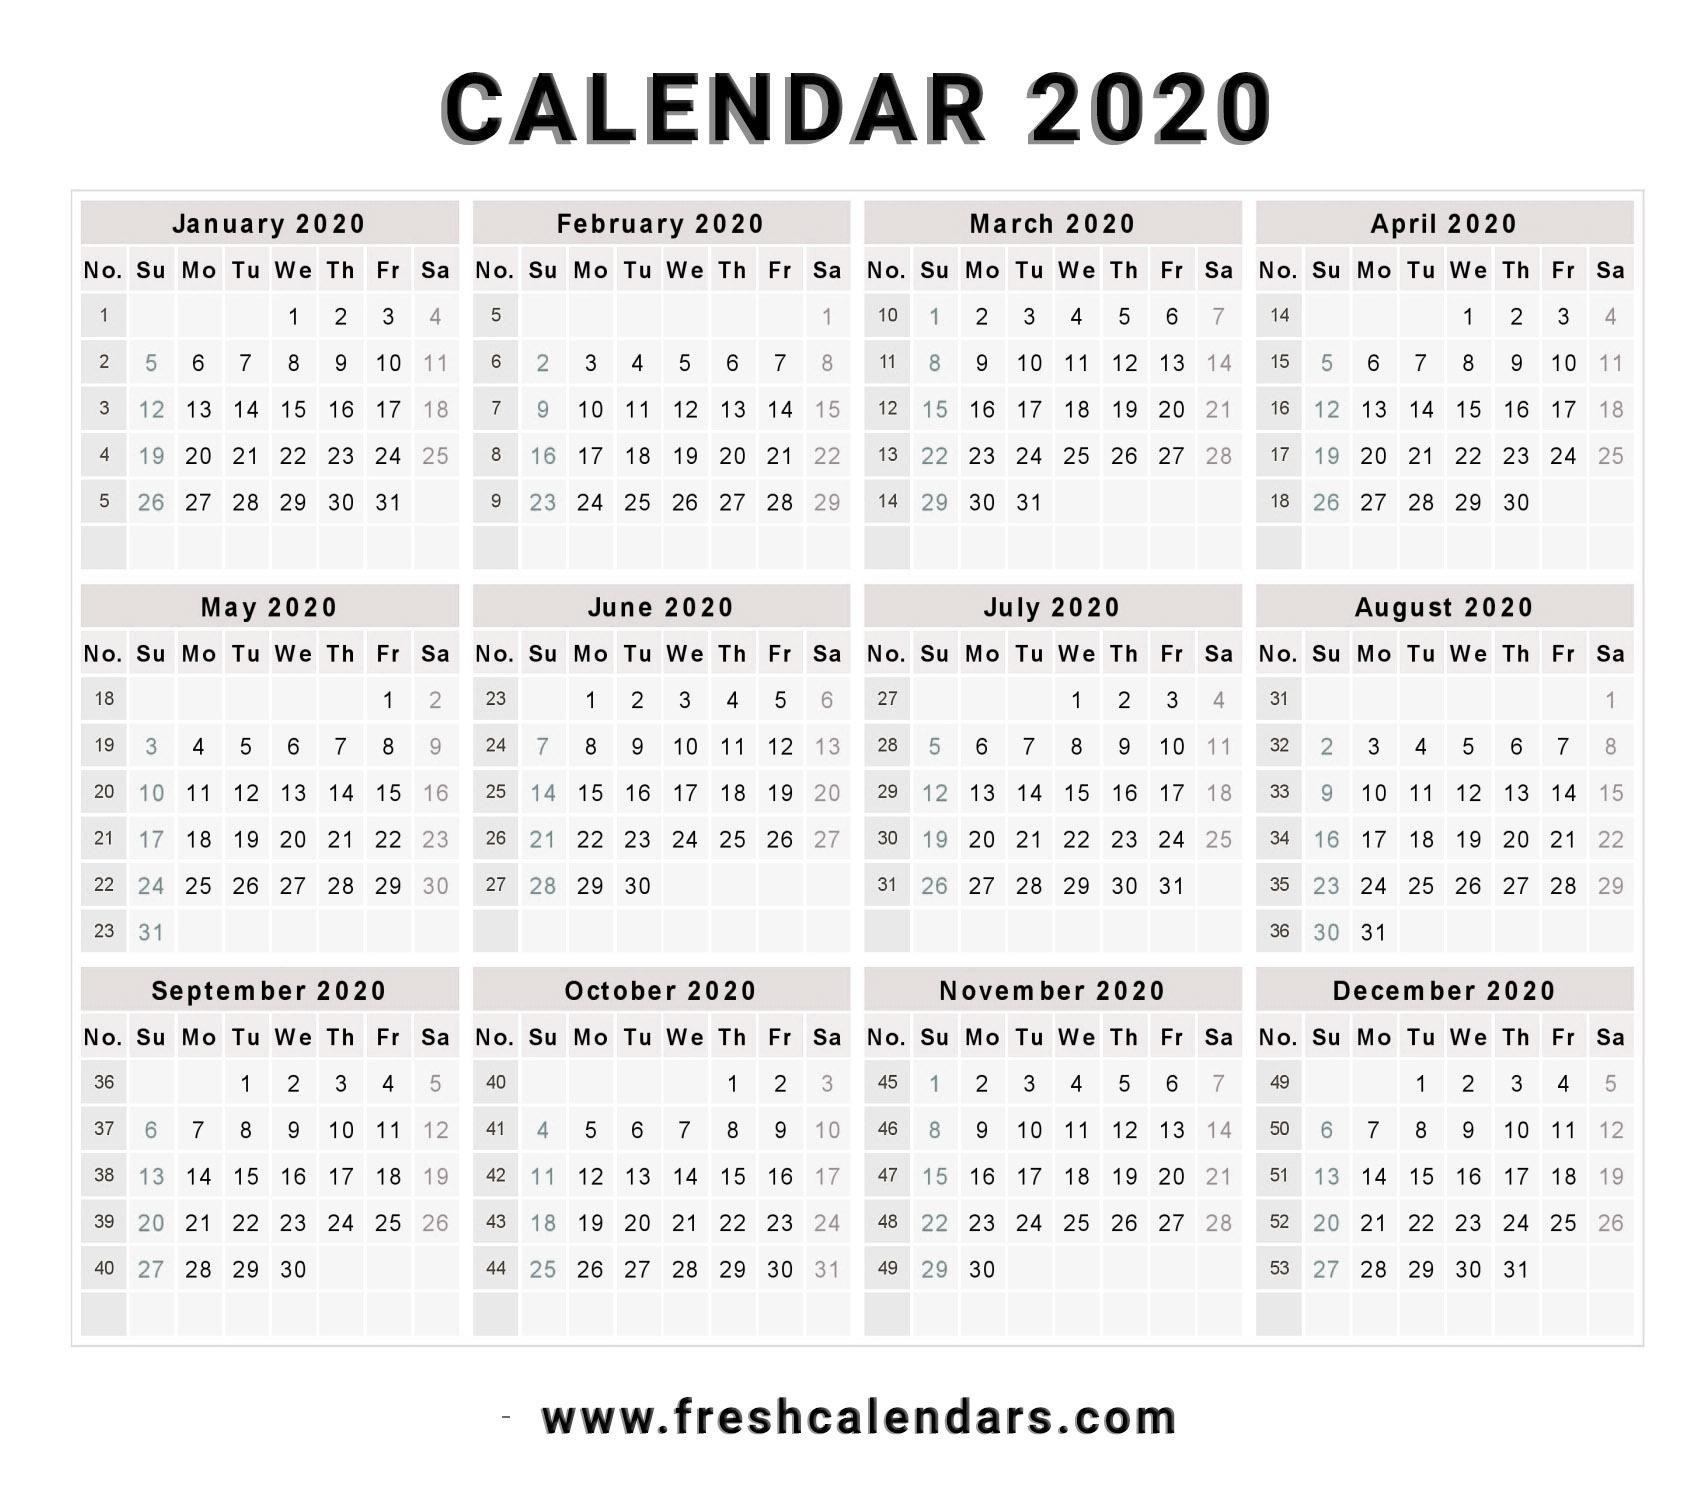 2020 Calendar in 2020 Printable Calendar Starting With Monday